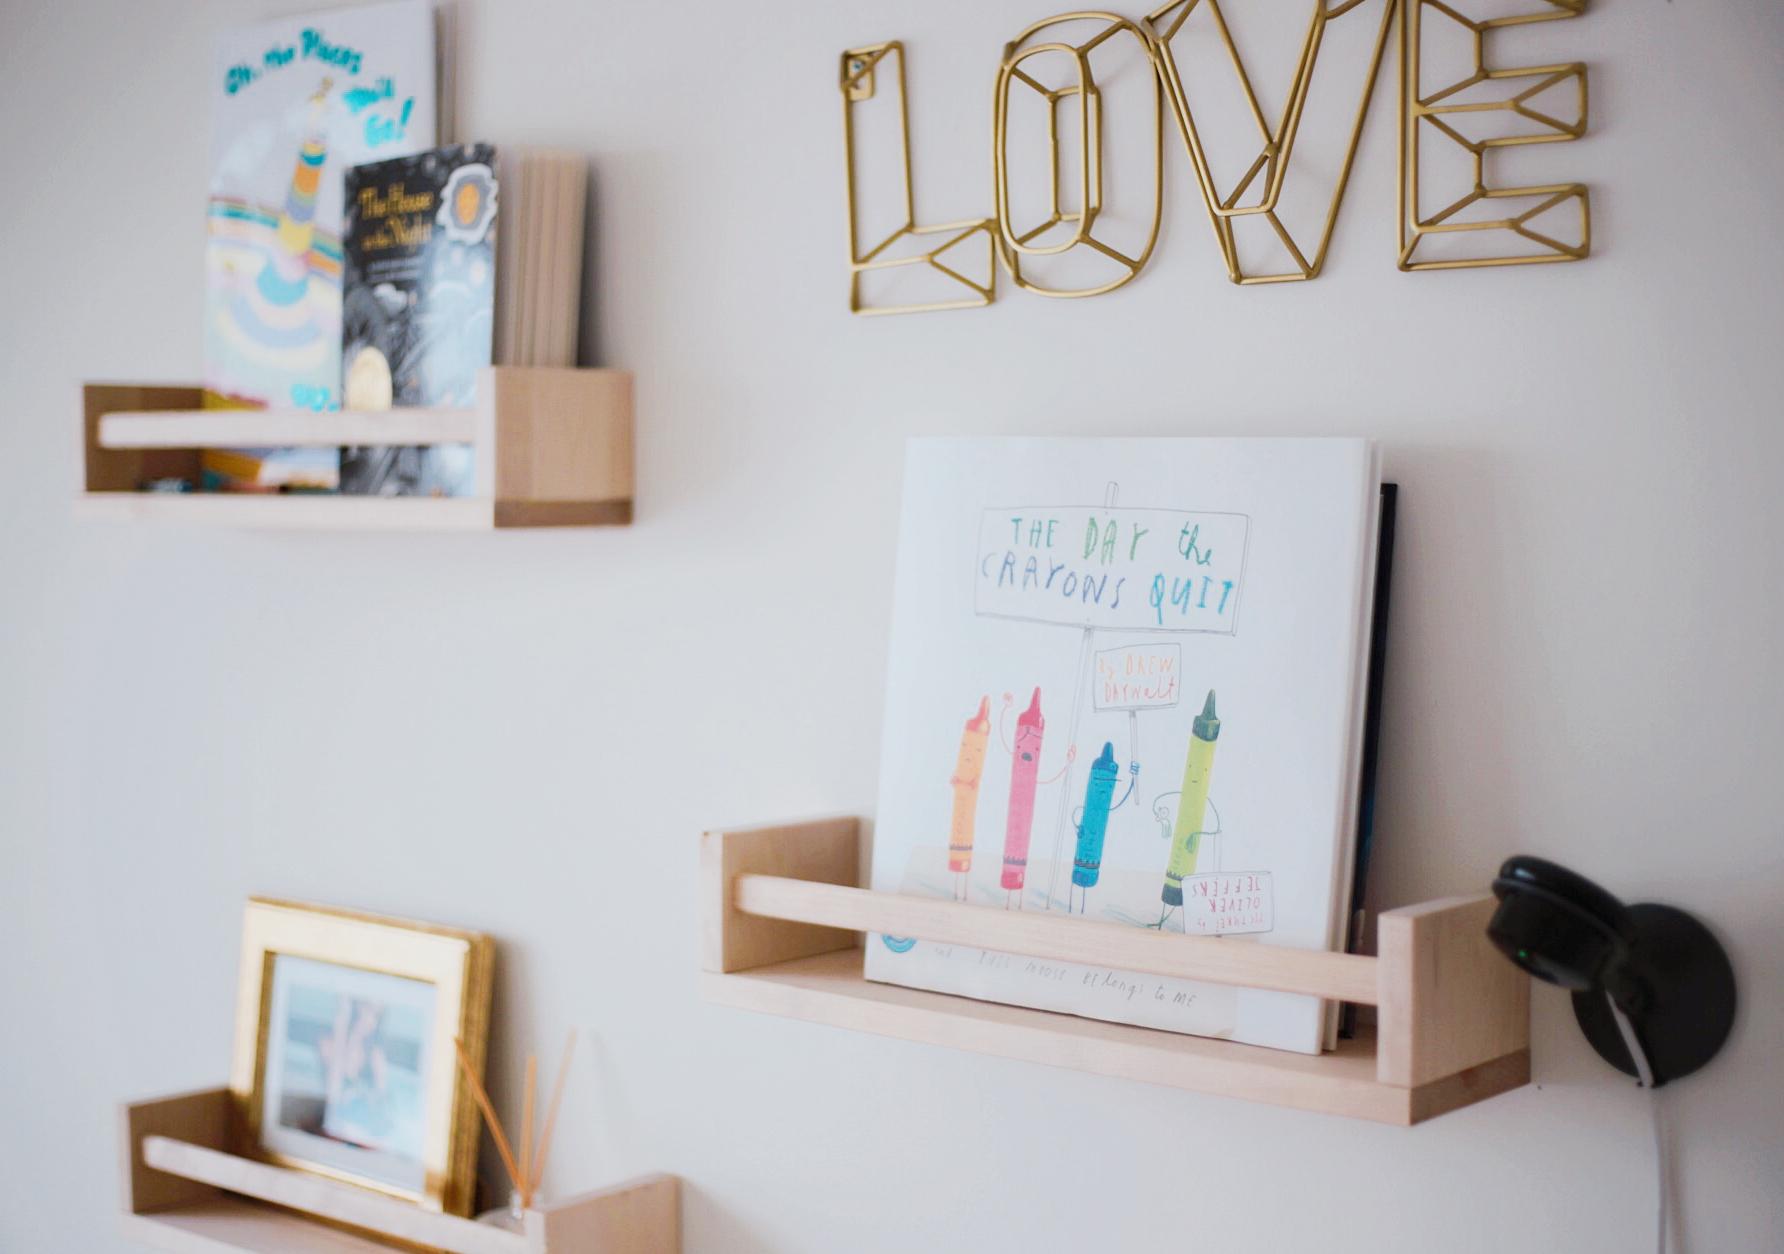 arya's room tour, the mom life nursery, toddler room ideas, grey neutral nursery, toddler nursery tour